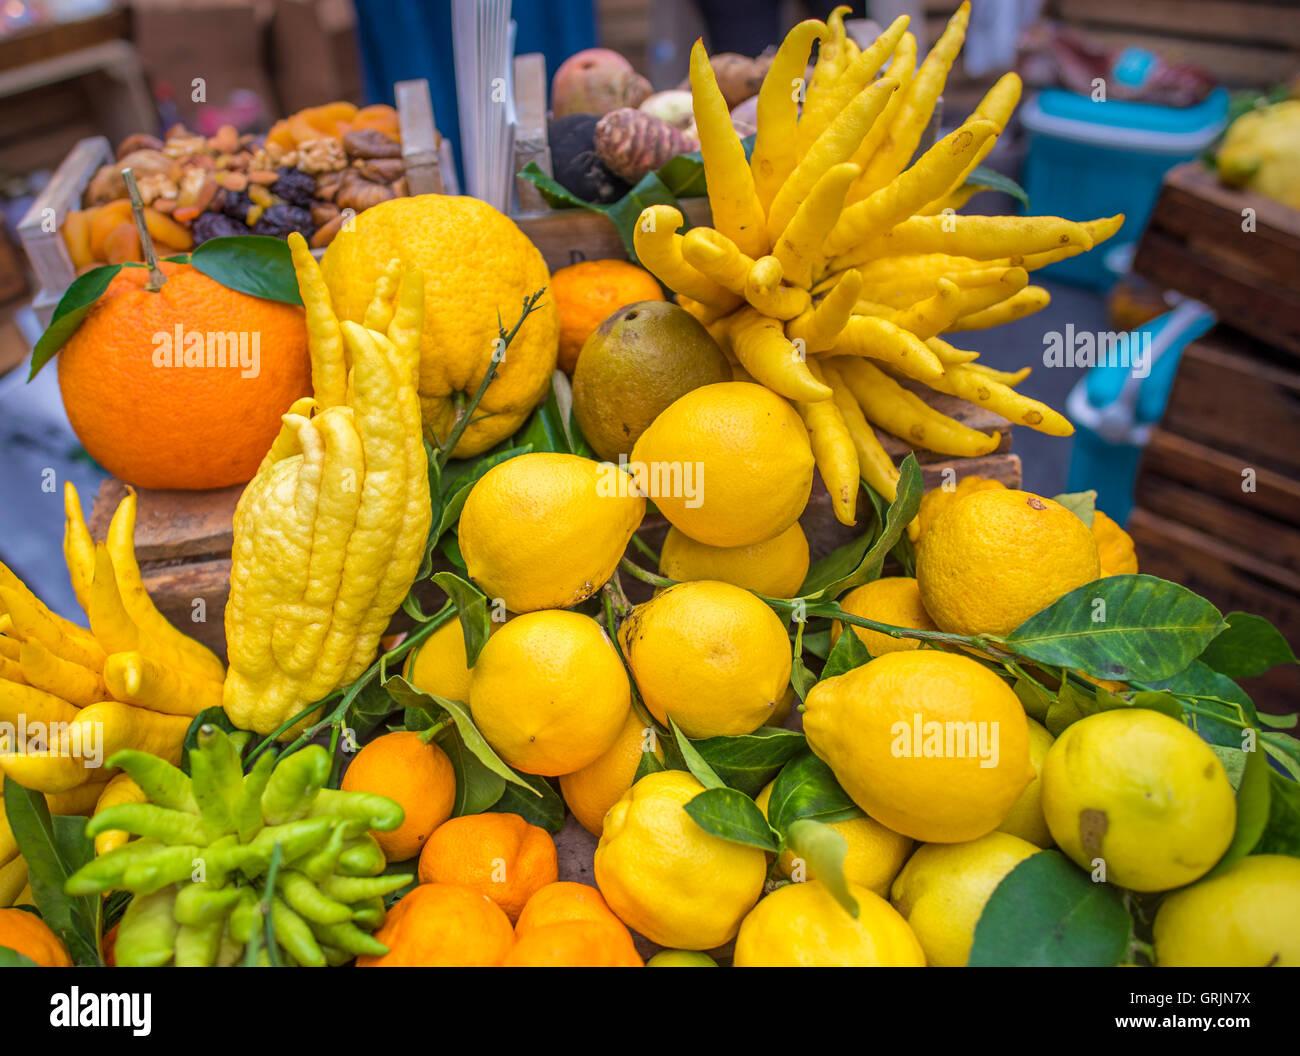 Mix of citrus fruits - Stock Image